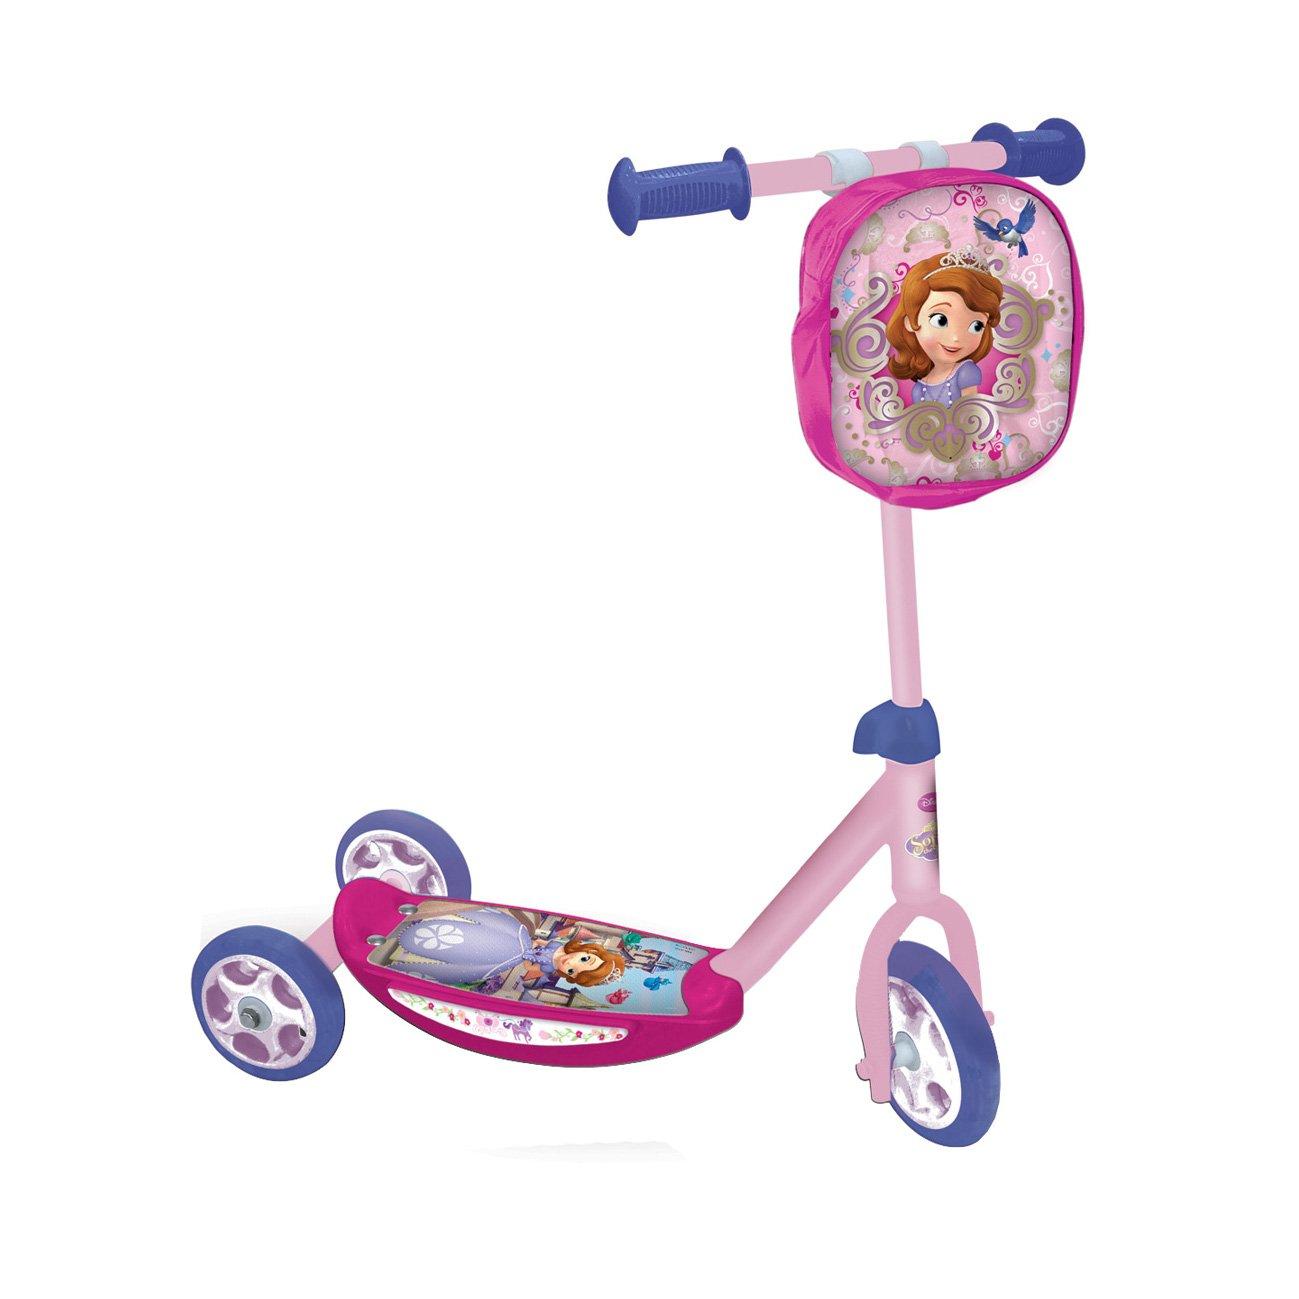 Mondo 28081 Sofia La Principessa Monopattino Baby My First Scooter 3 Ruote